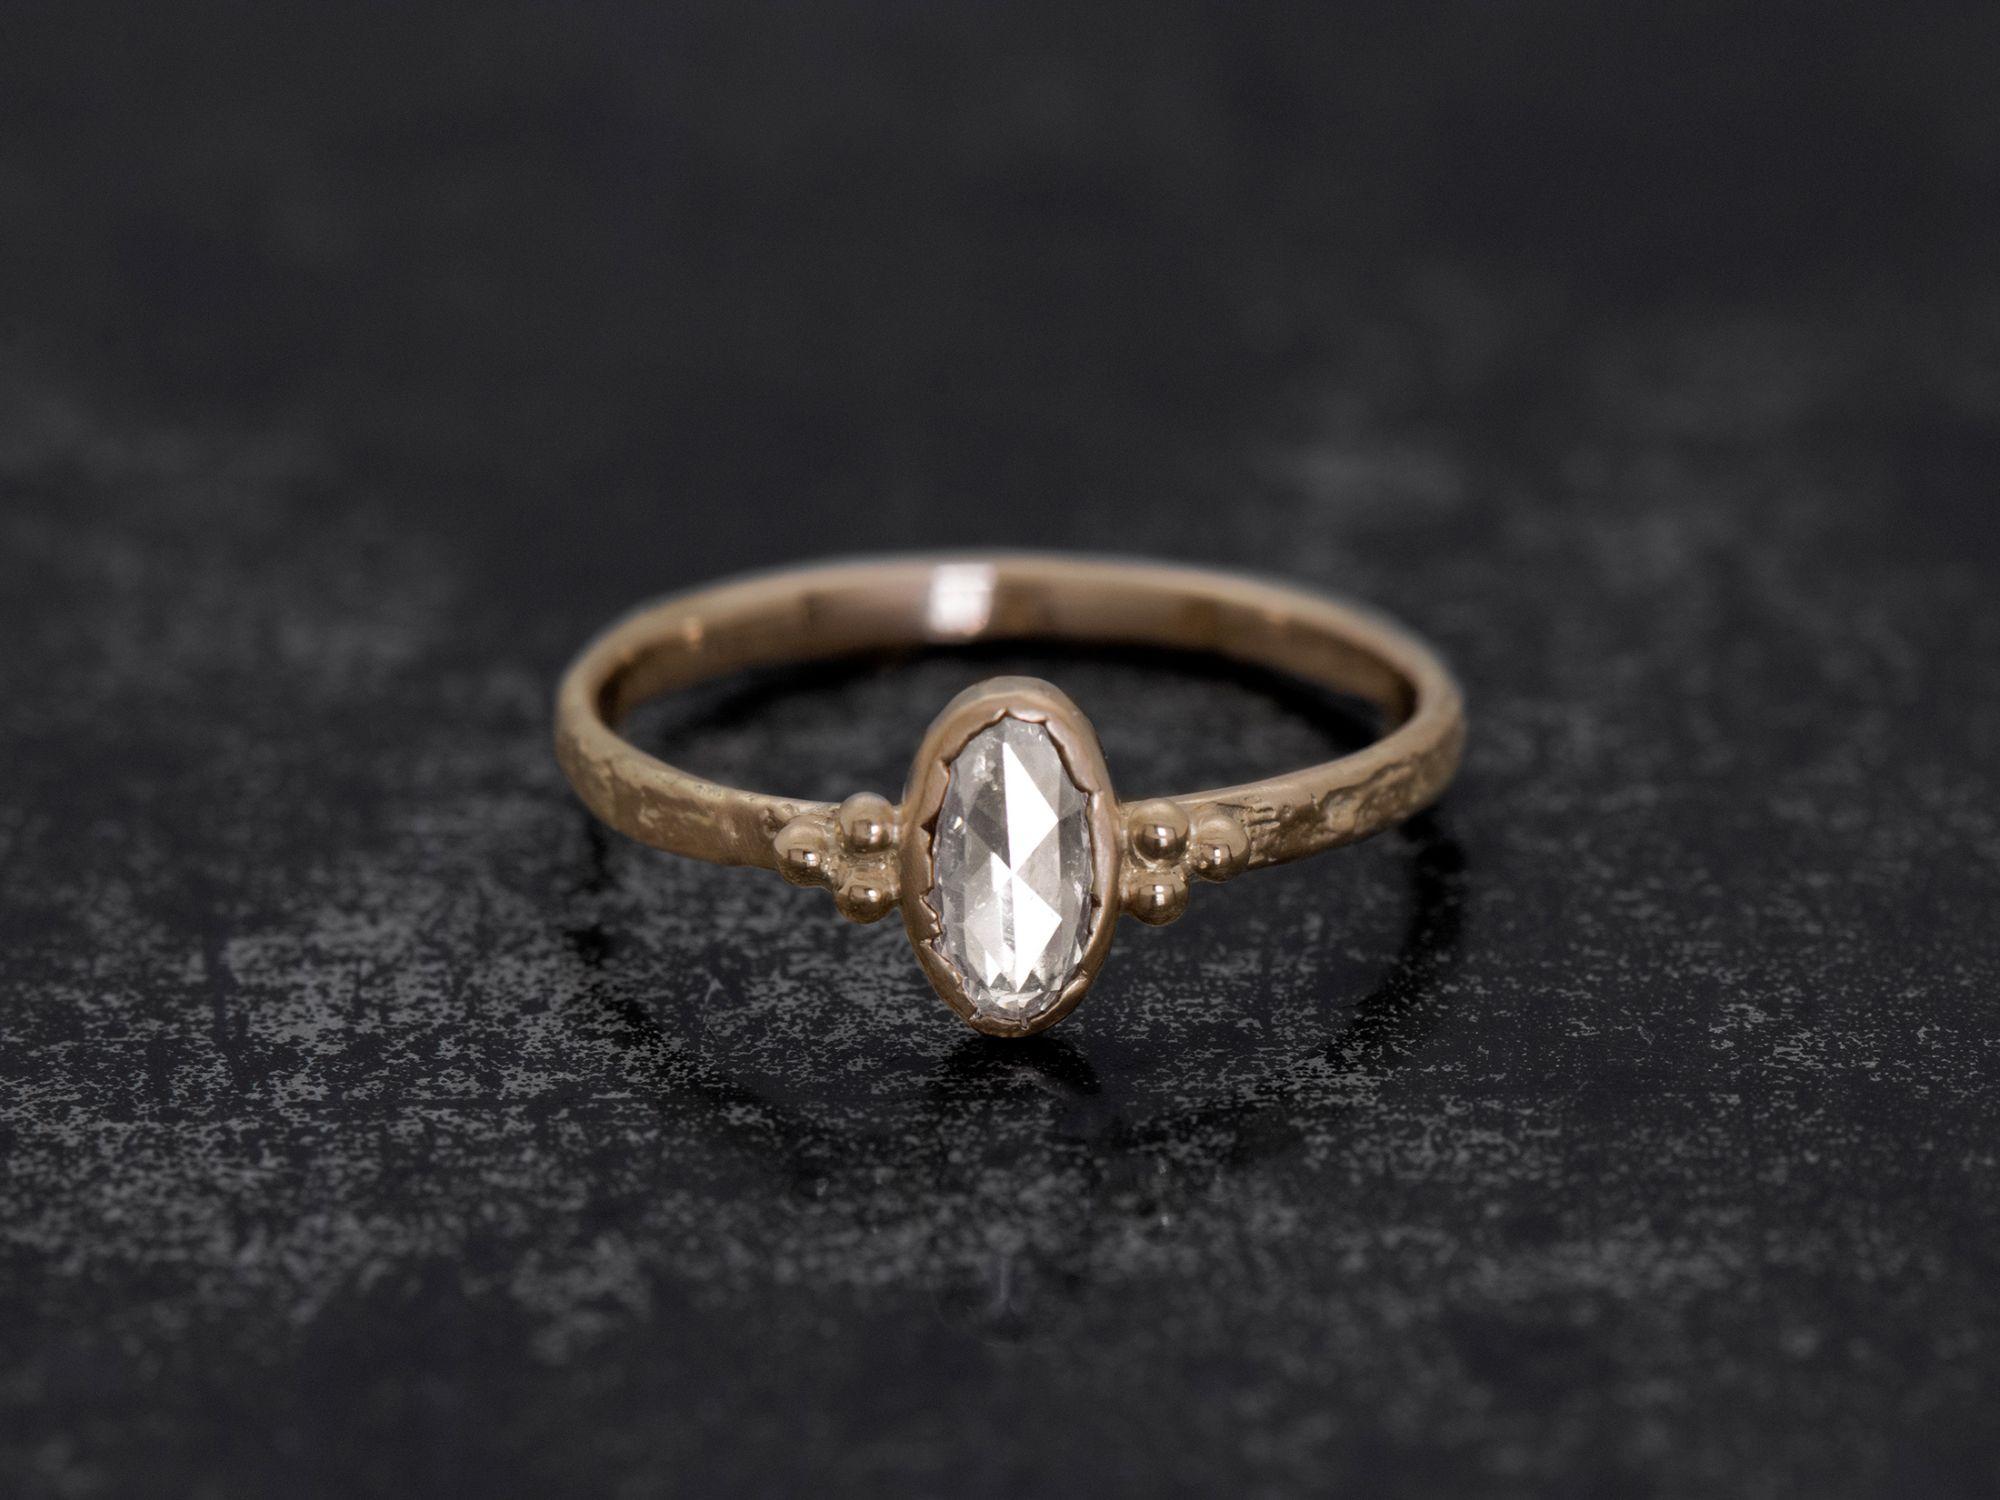 Romy oval rosecut honey diamond ring by Emmanuelle Zysman